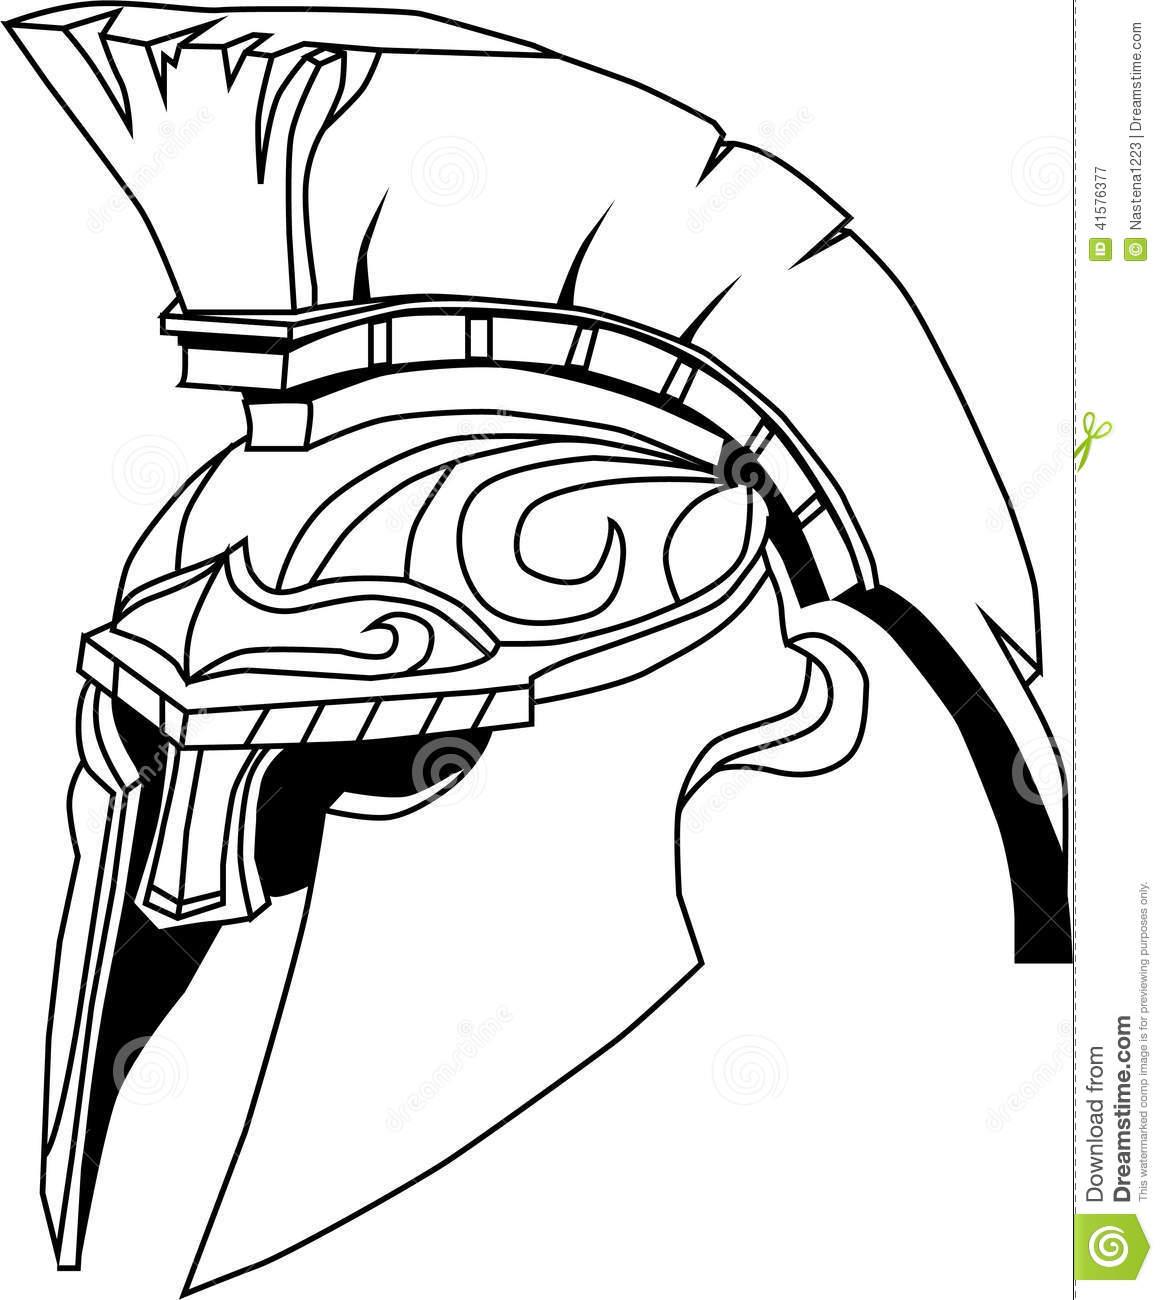 1163x1300 Spartan Helmet Drawing Spartan Helmet (Illustration Of An Ancient